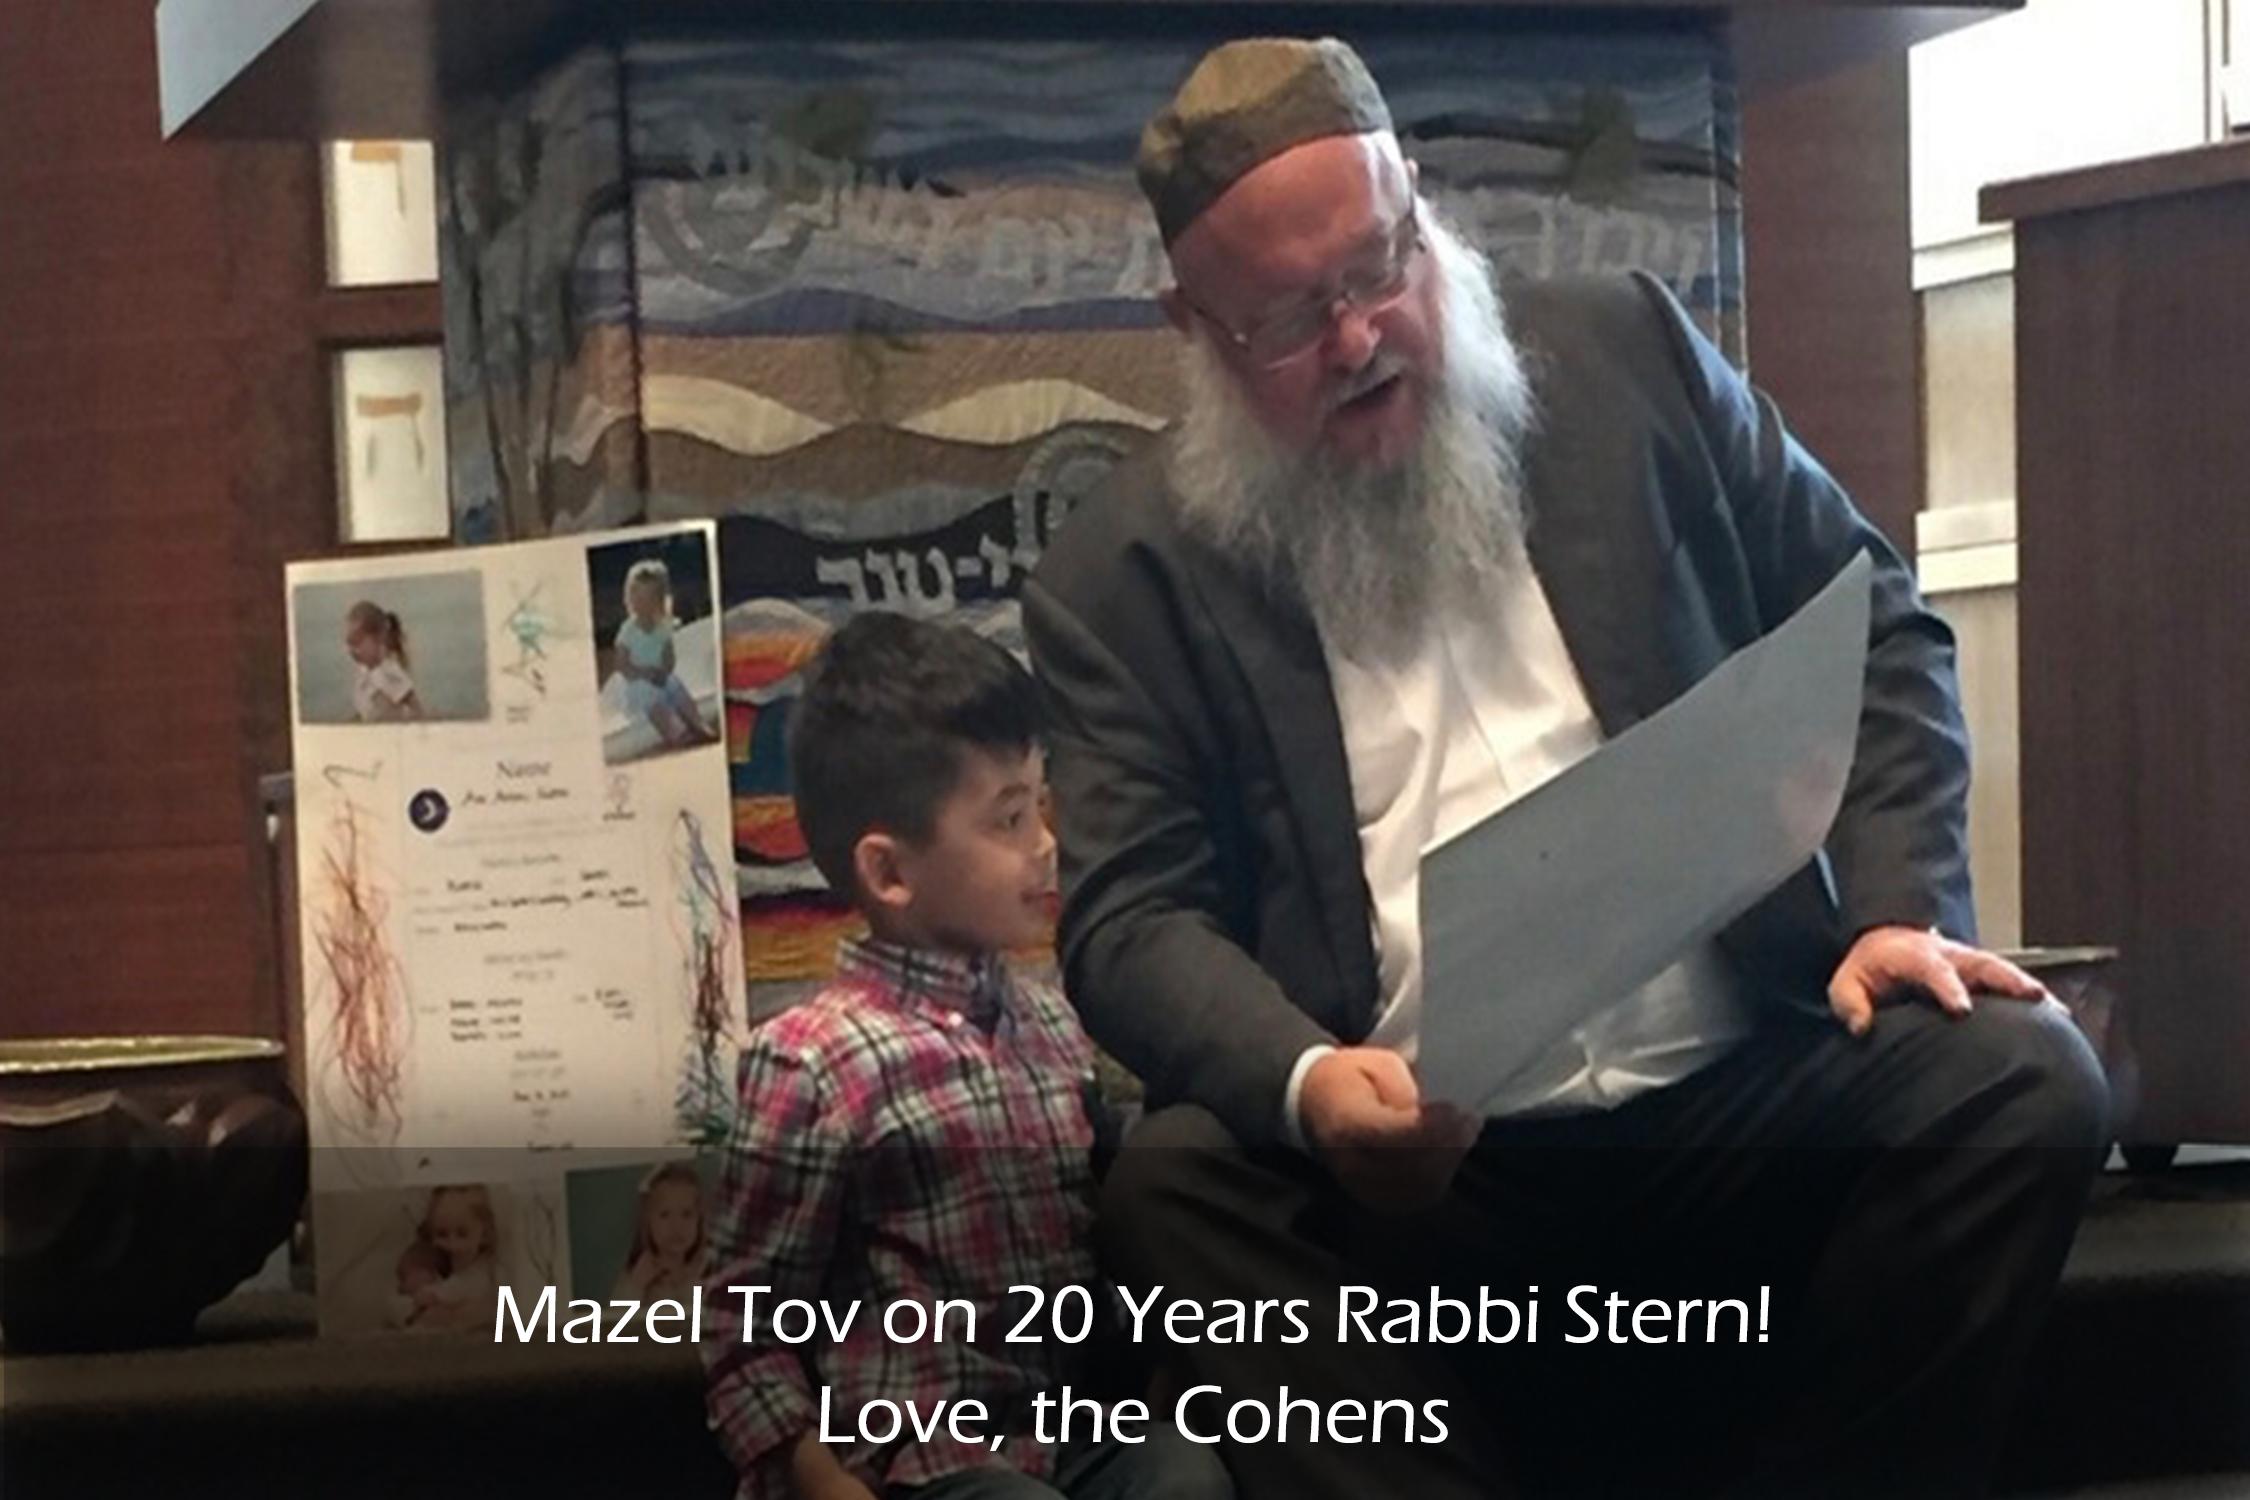 Rabbi Keith Stern's 20th Anniversary